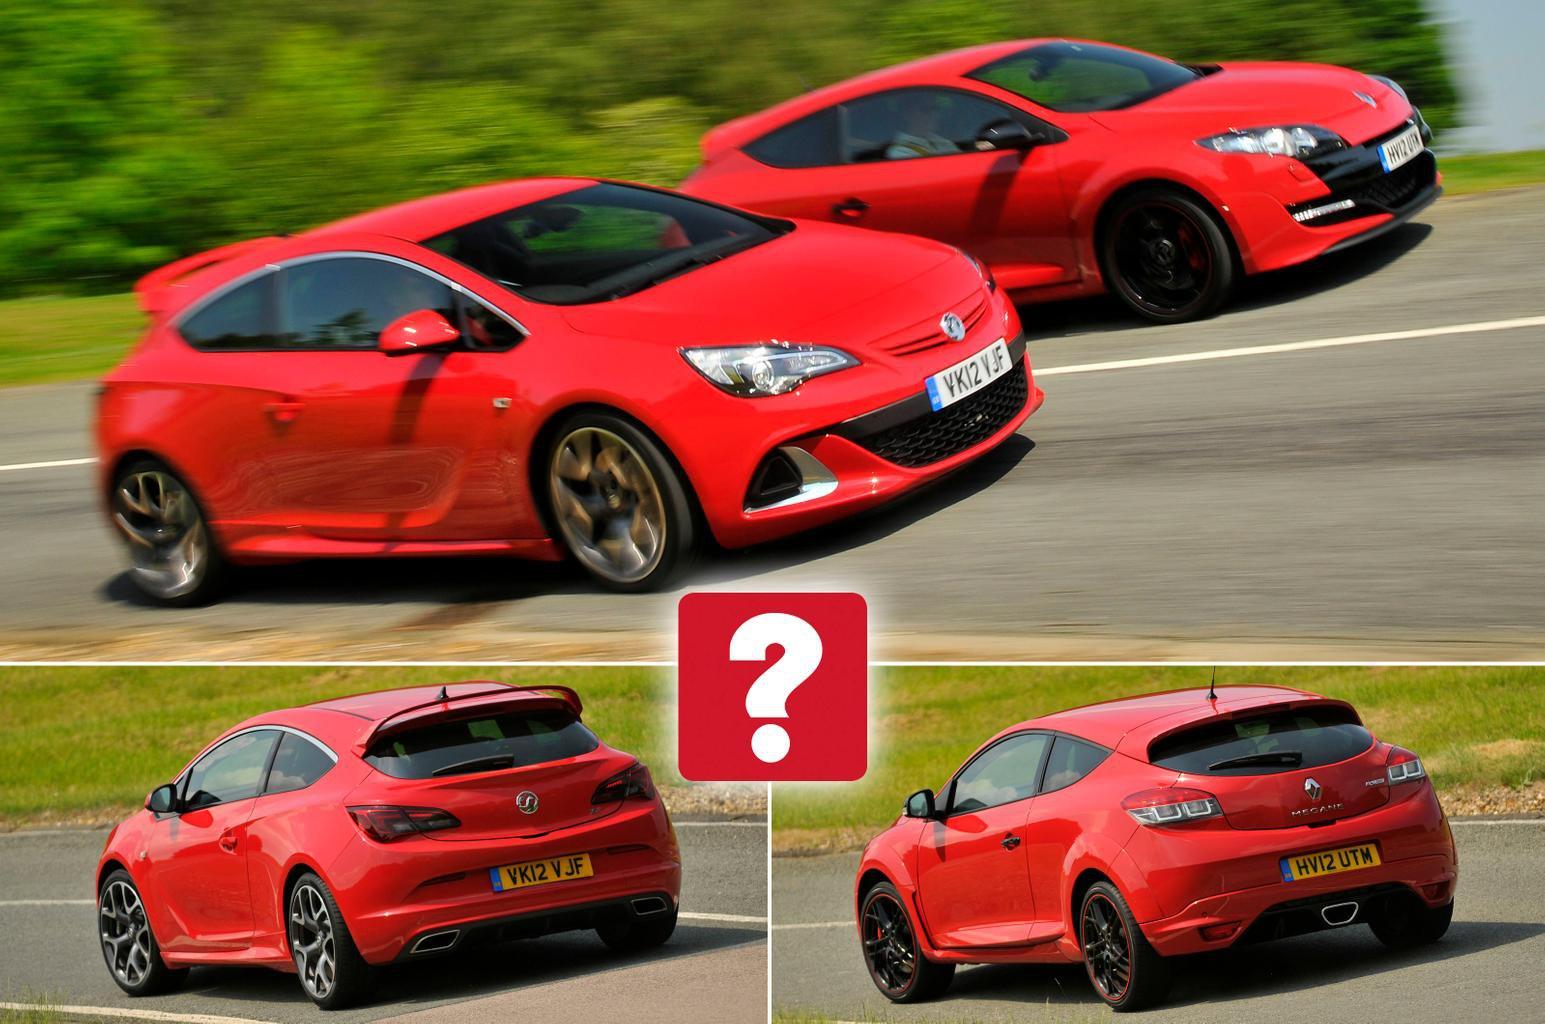 Used Renault Sport Megane vs Vauxhall Astra VXR